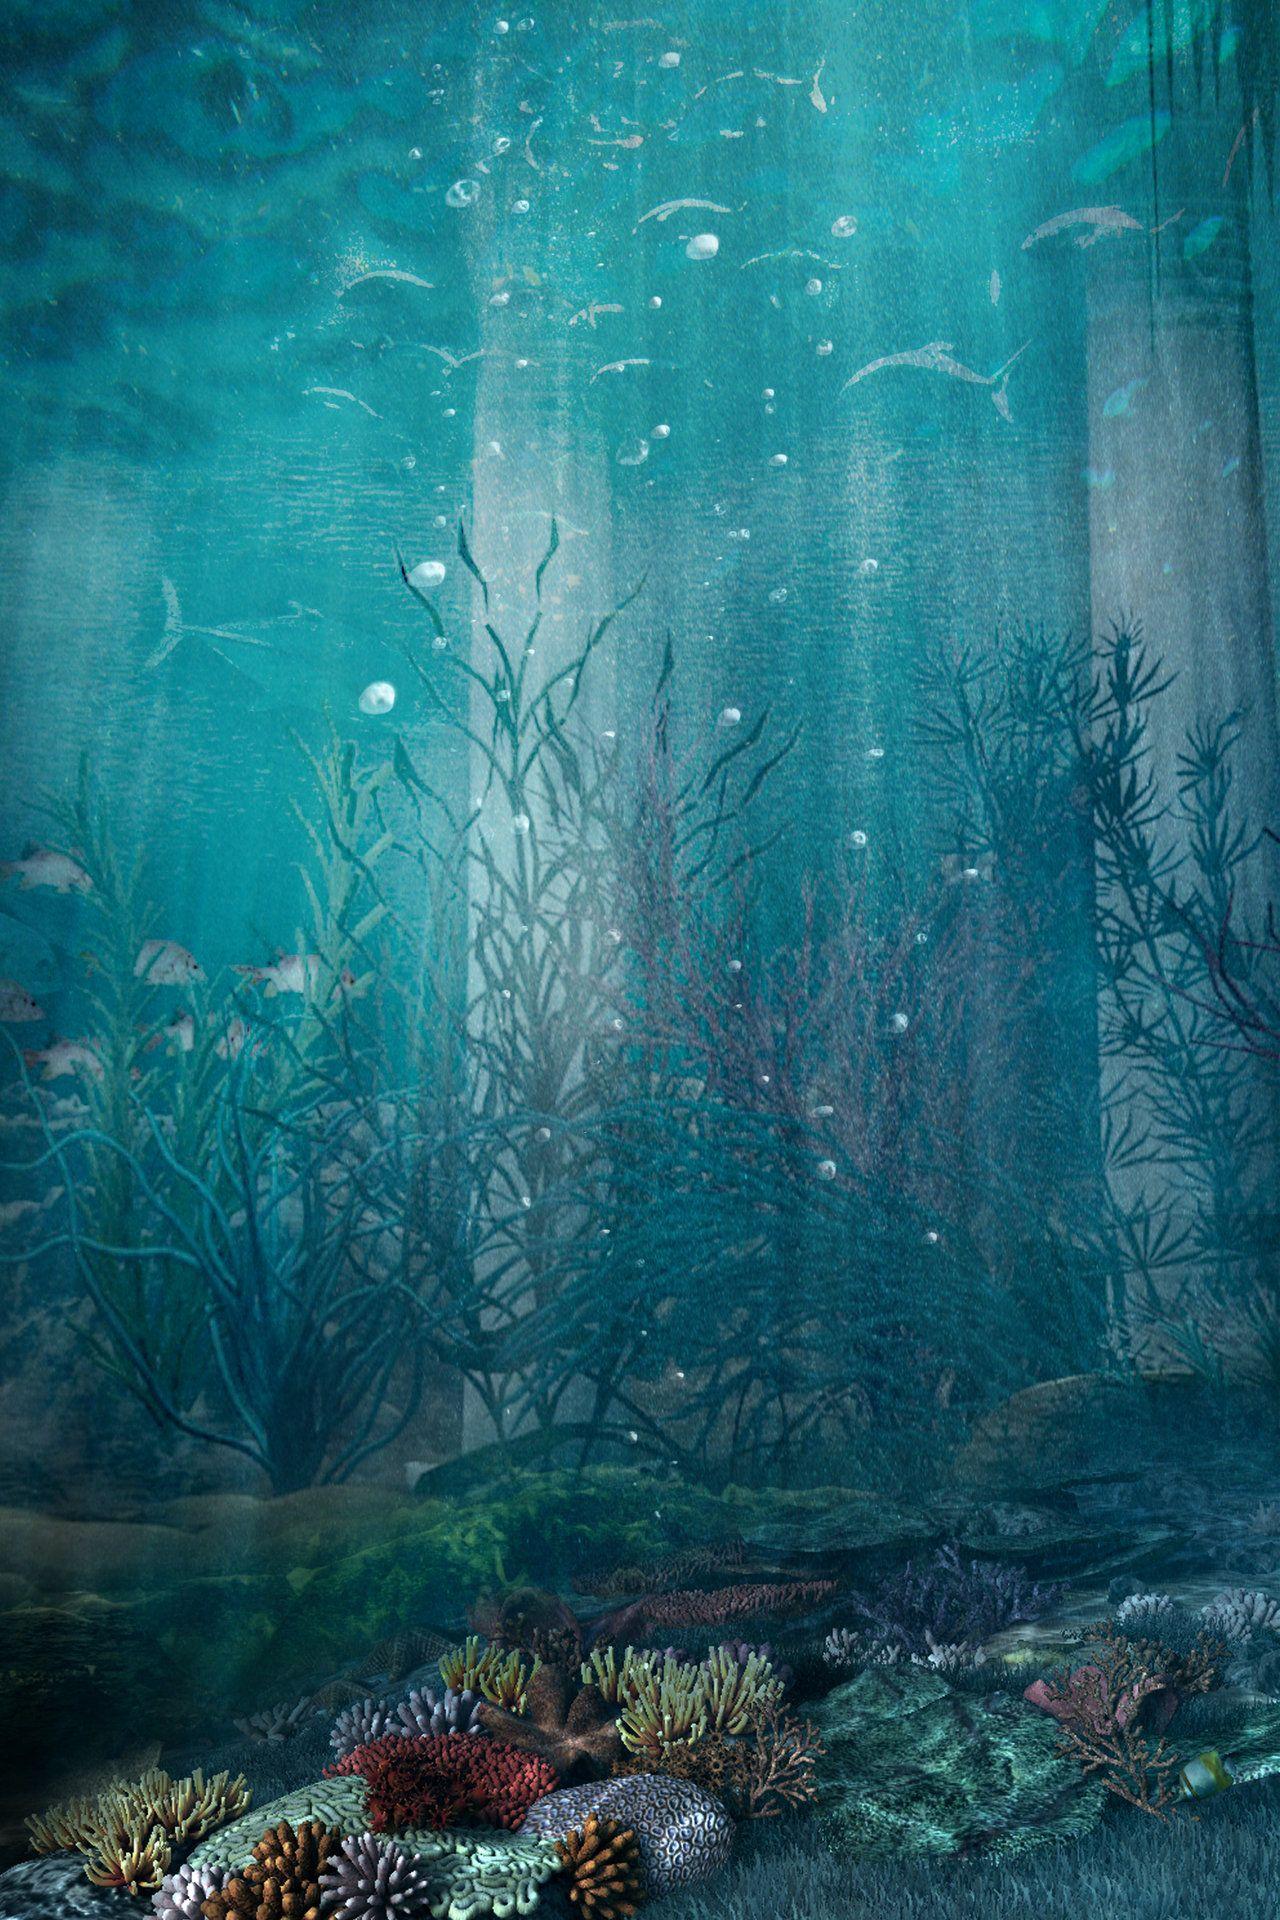 Premade Bg Under The Sea 1 By Georgina Gibson Deviantart Com On Deviantart Ocean Photography Under The Sea Background Underwater Painting